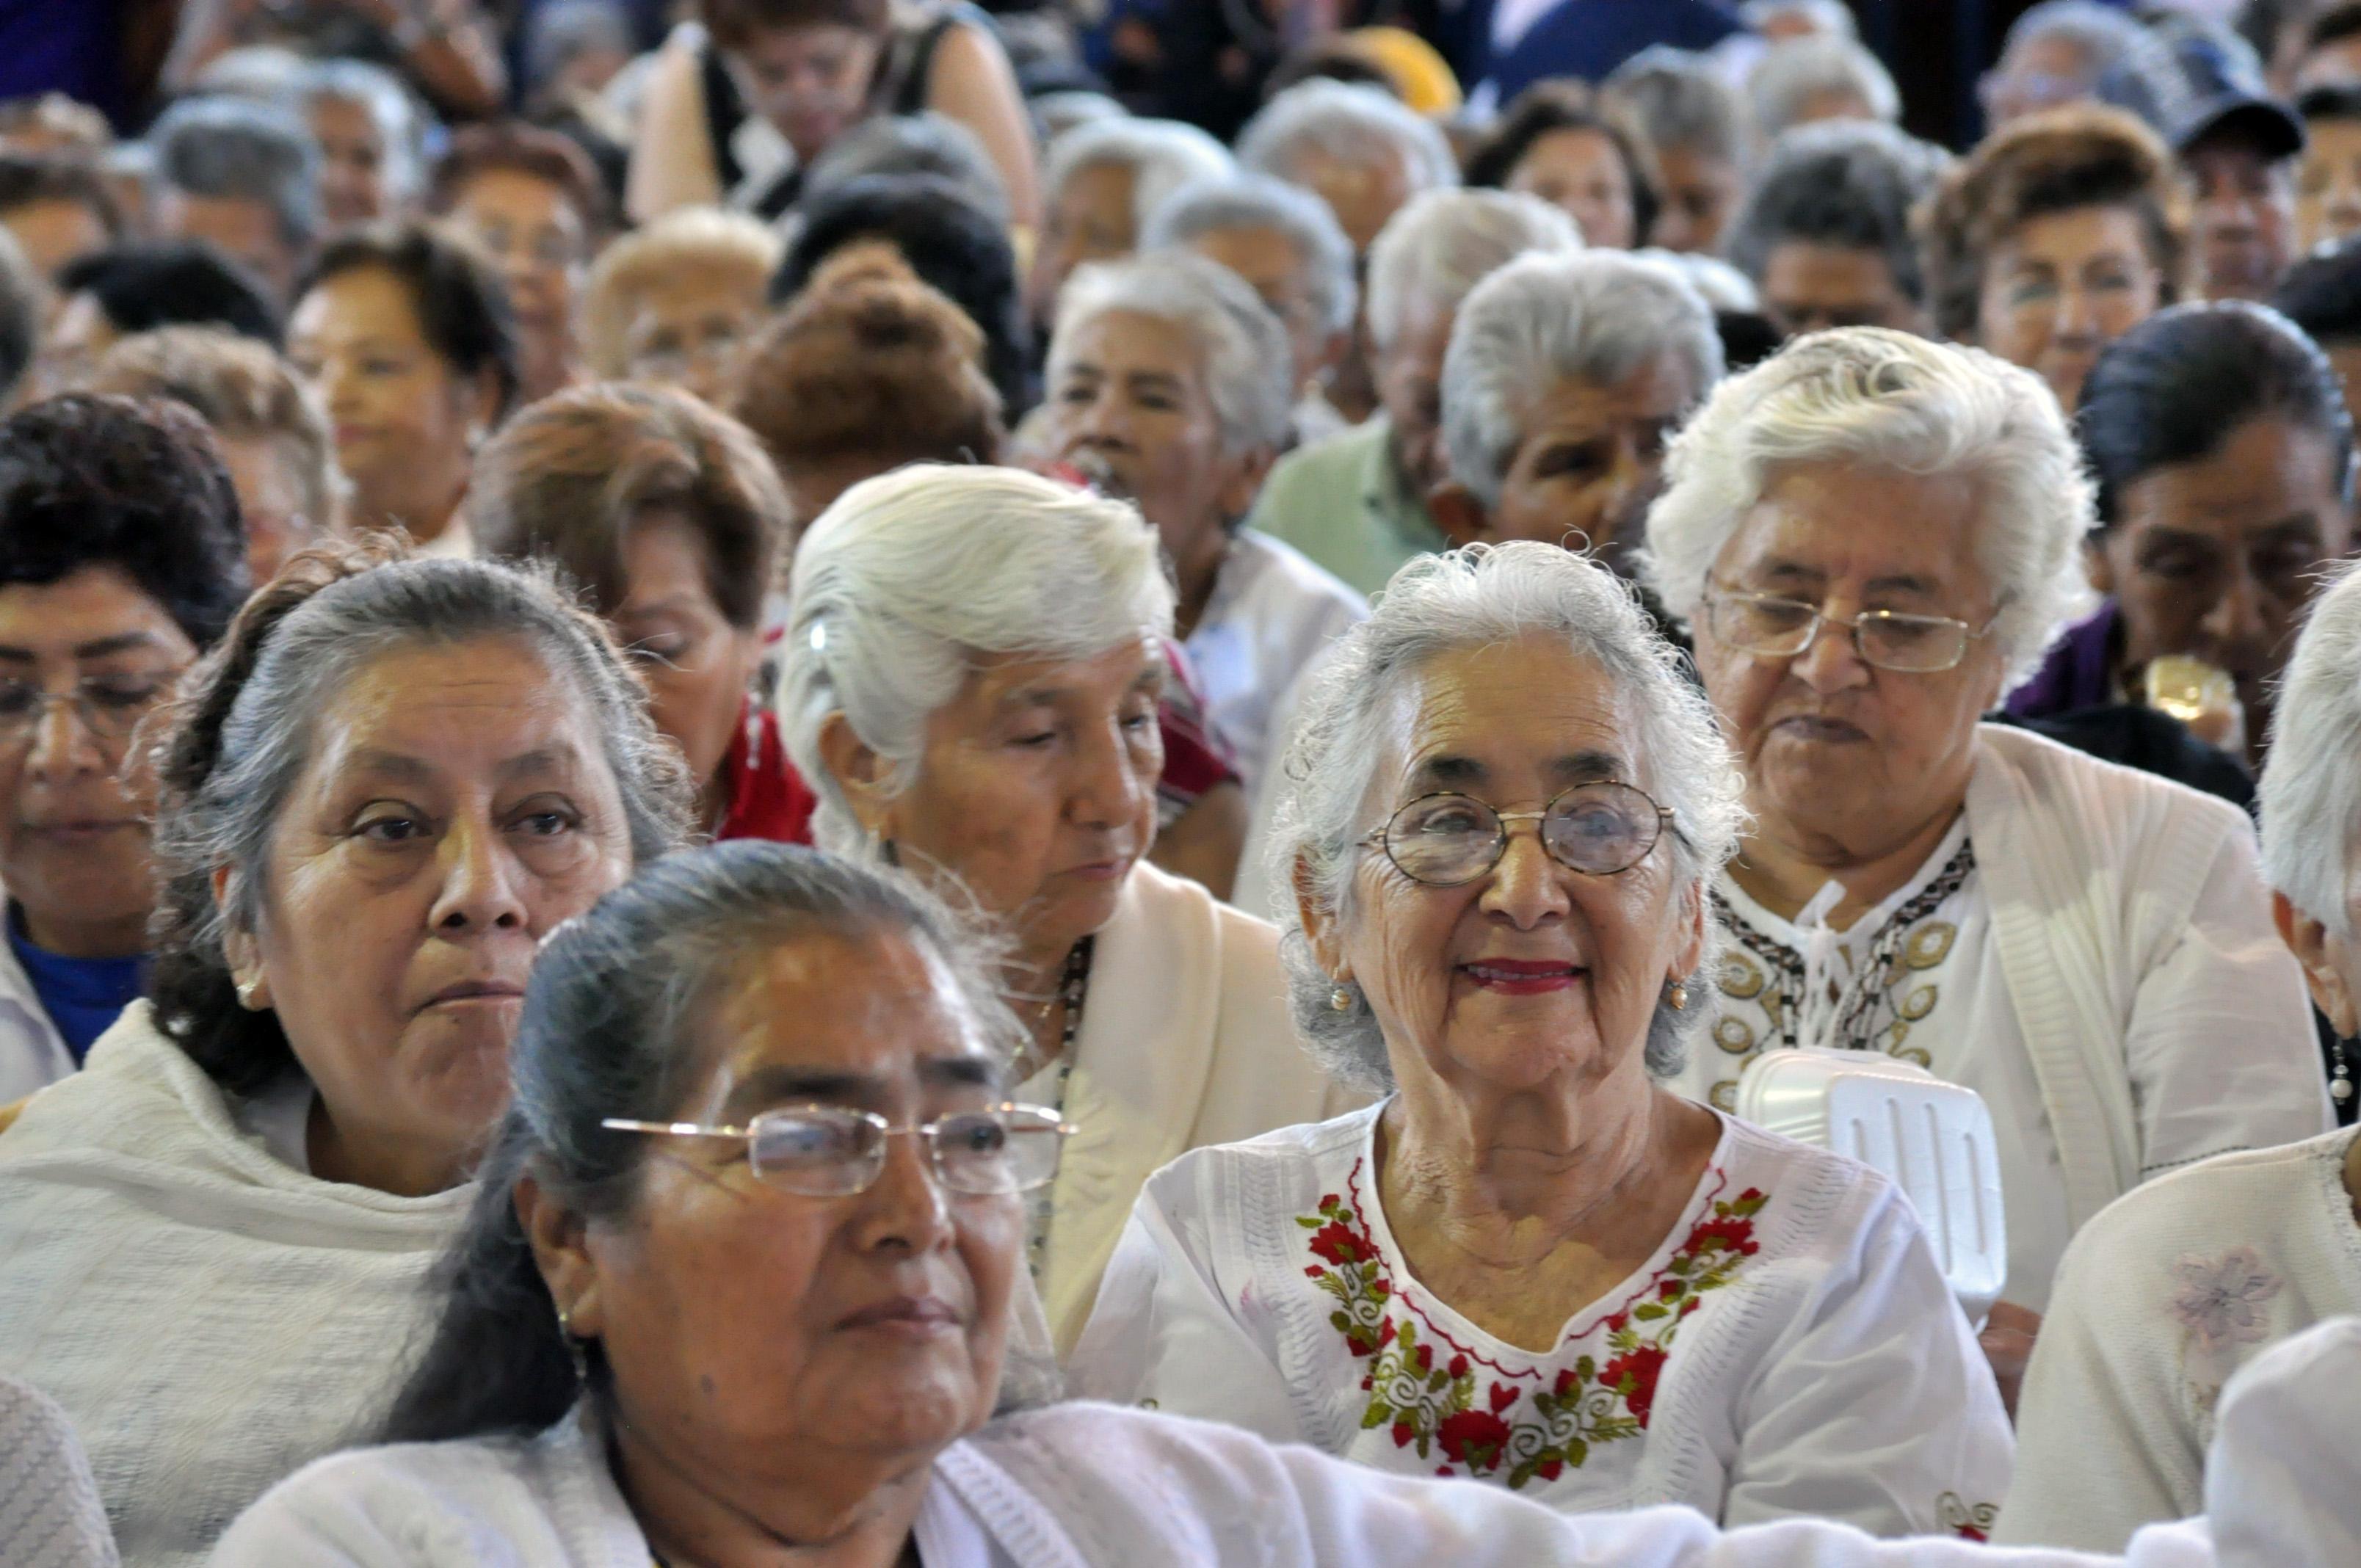 Casi dos millones de adultos mayores sufre abusos for Sillon alto para personas mayores